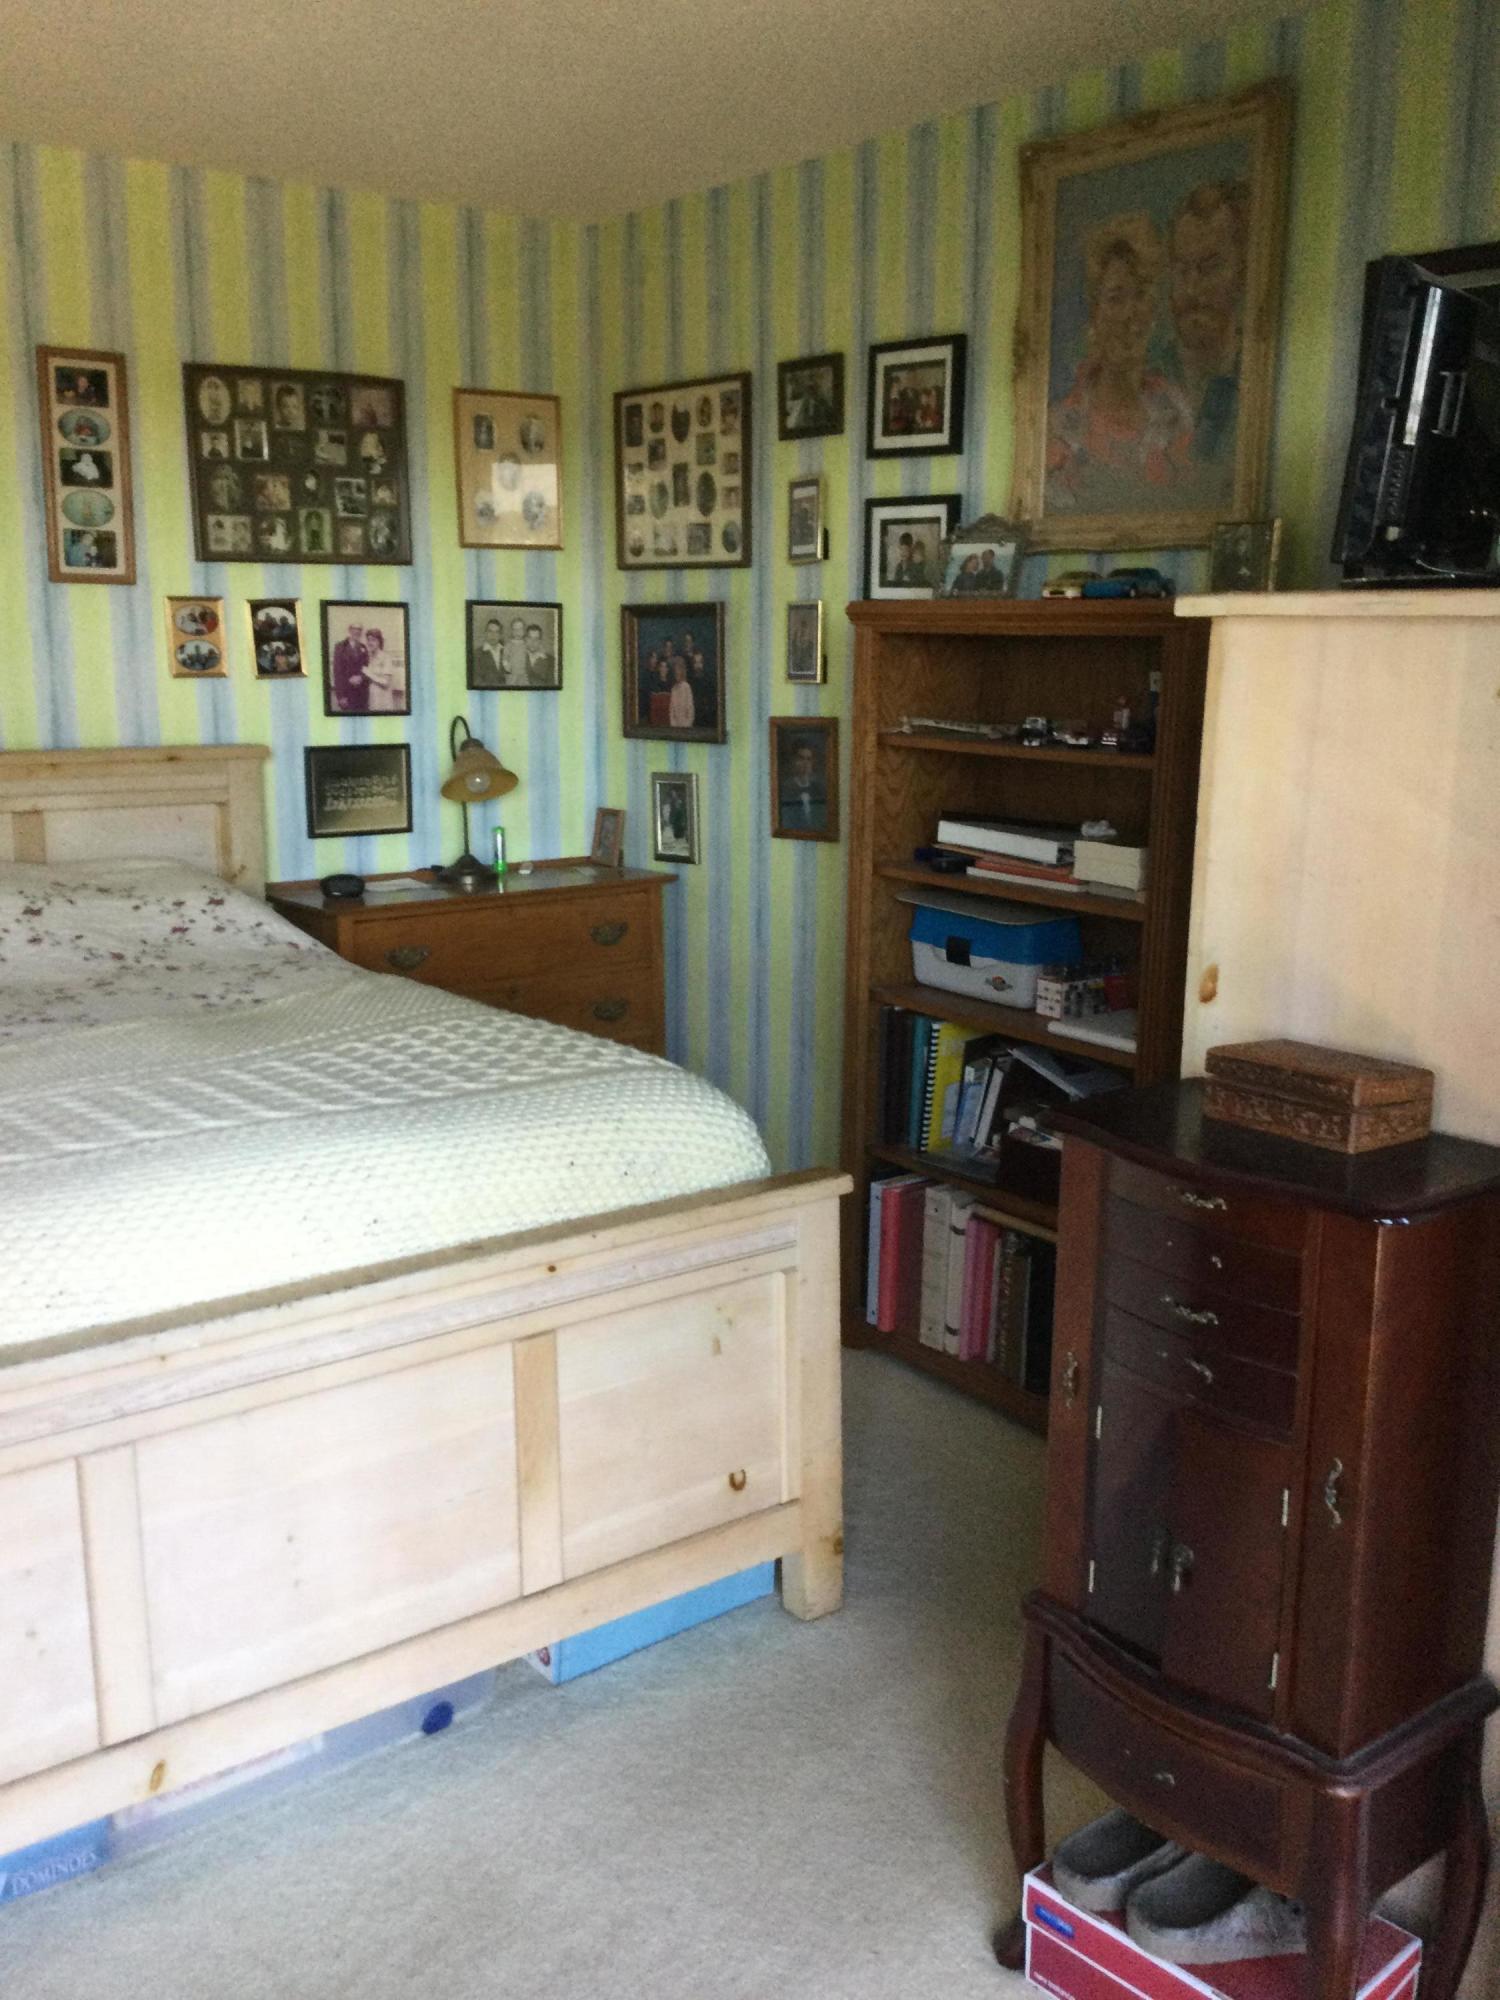 Marshview Villas Homes For Sale - 124 Mariners Cay, Folly Beach, SC - 3